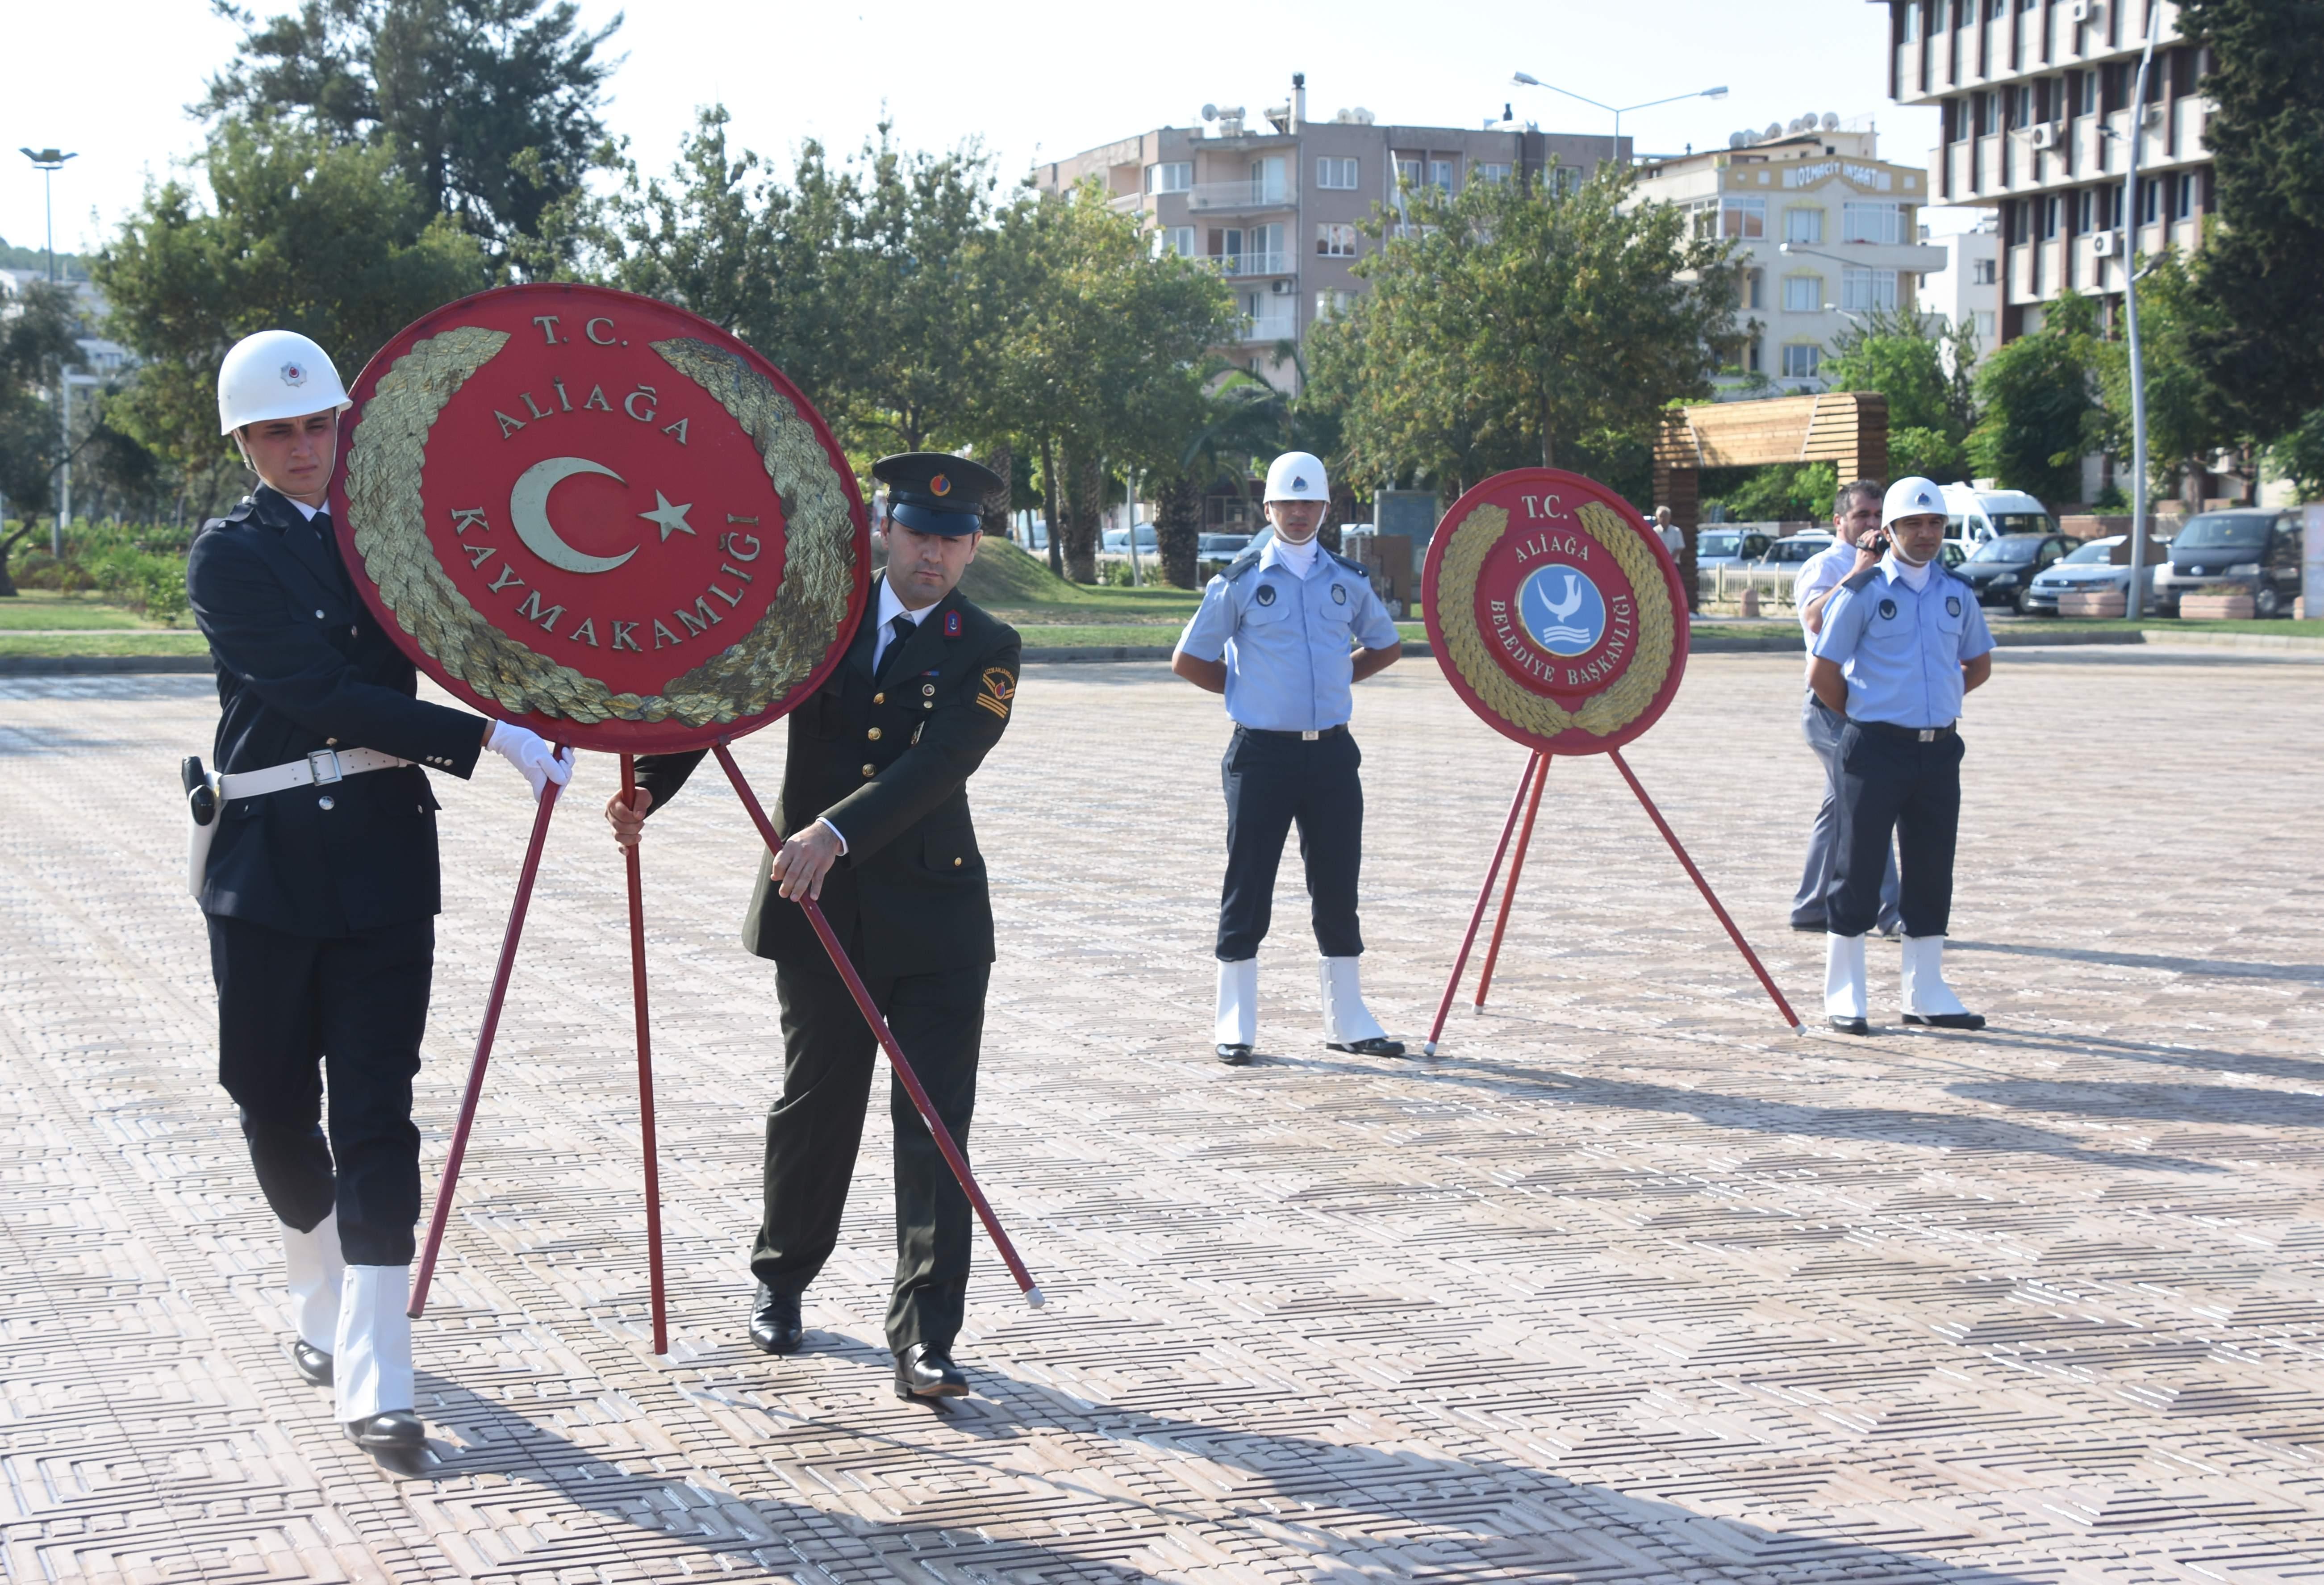 ALİAĞA'DA ZAFER BAYRAMI KUTLAMA PROGRAMI BELLİ OLDU..